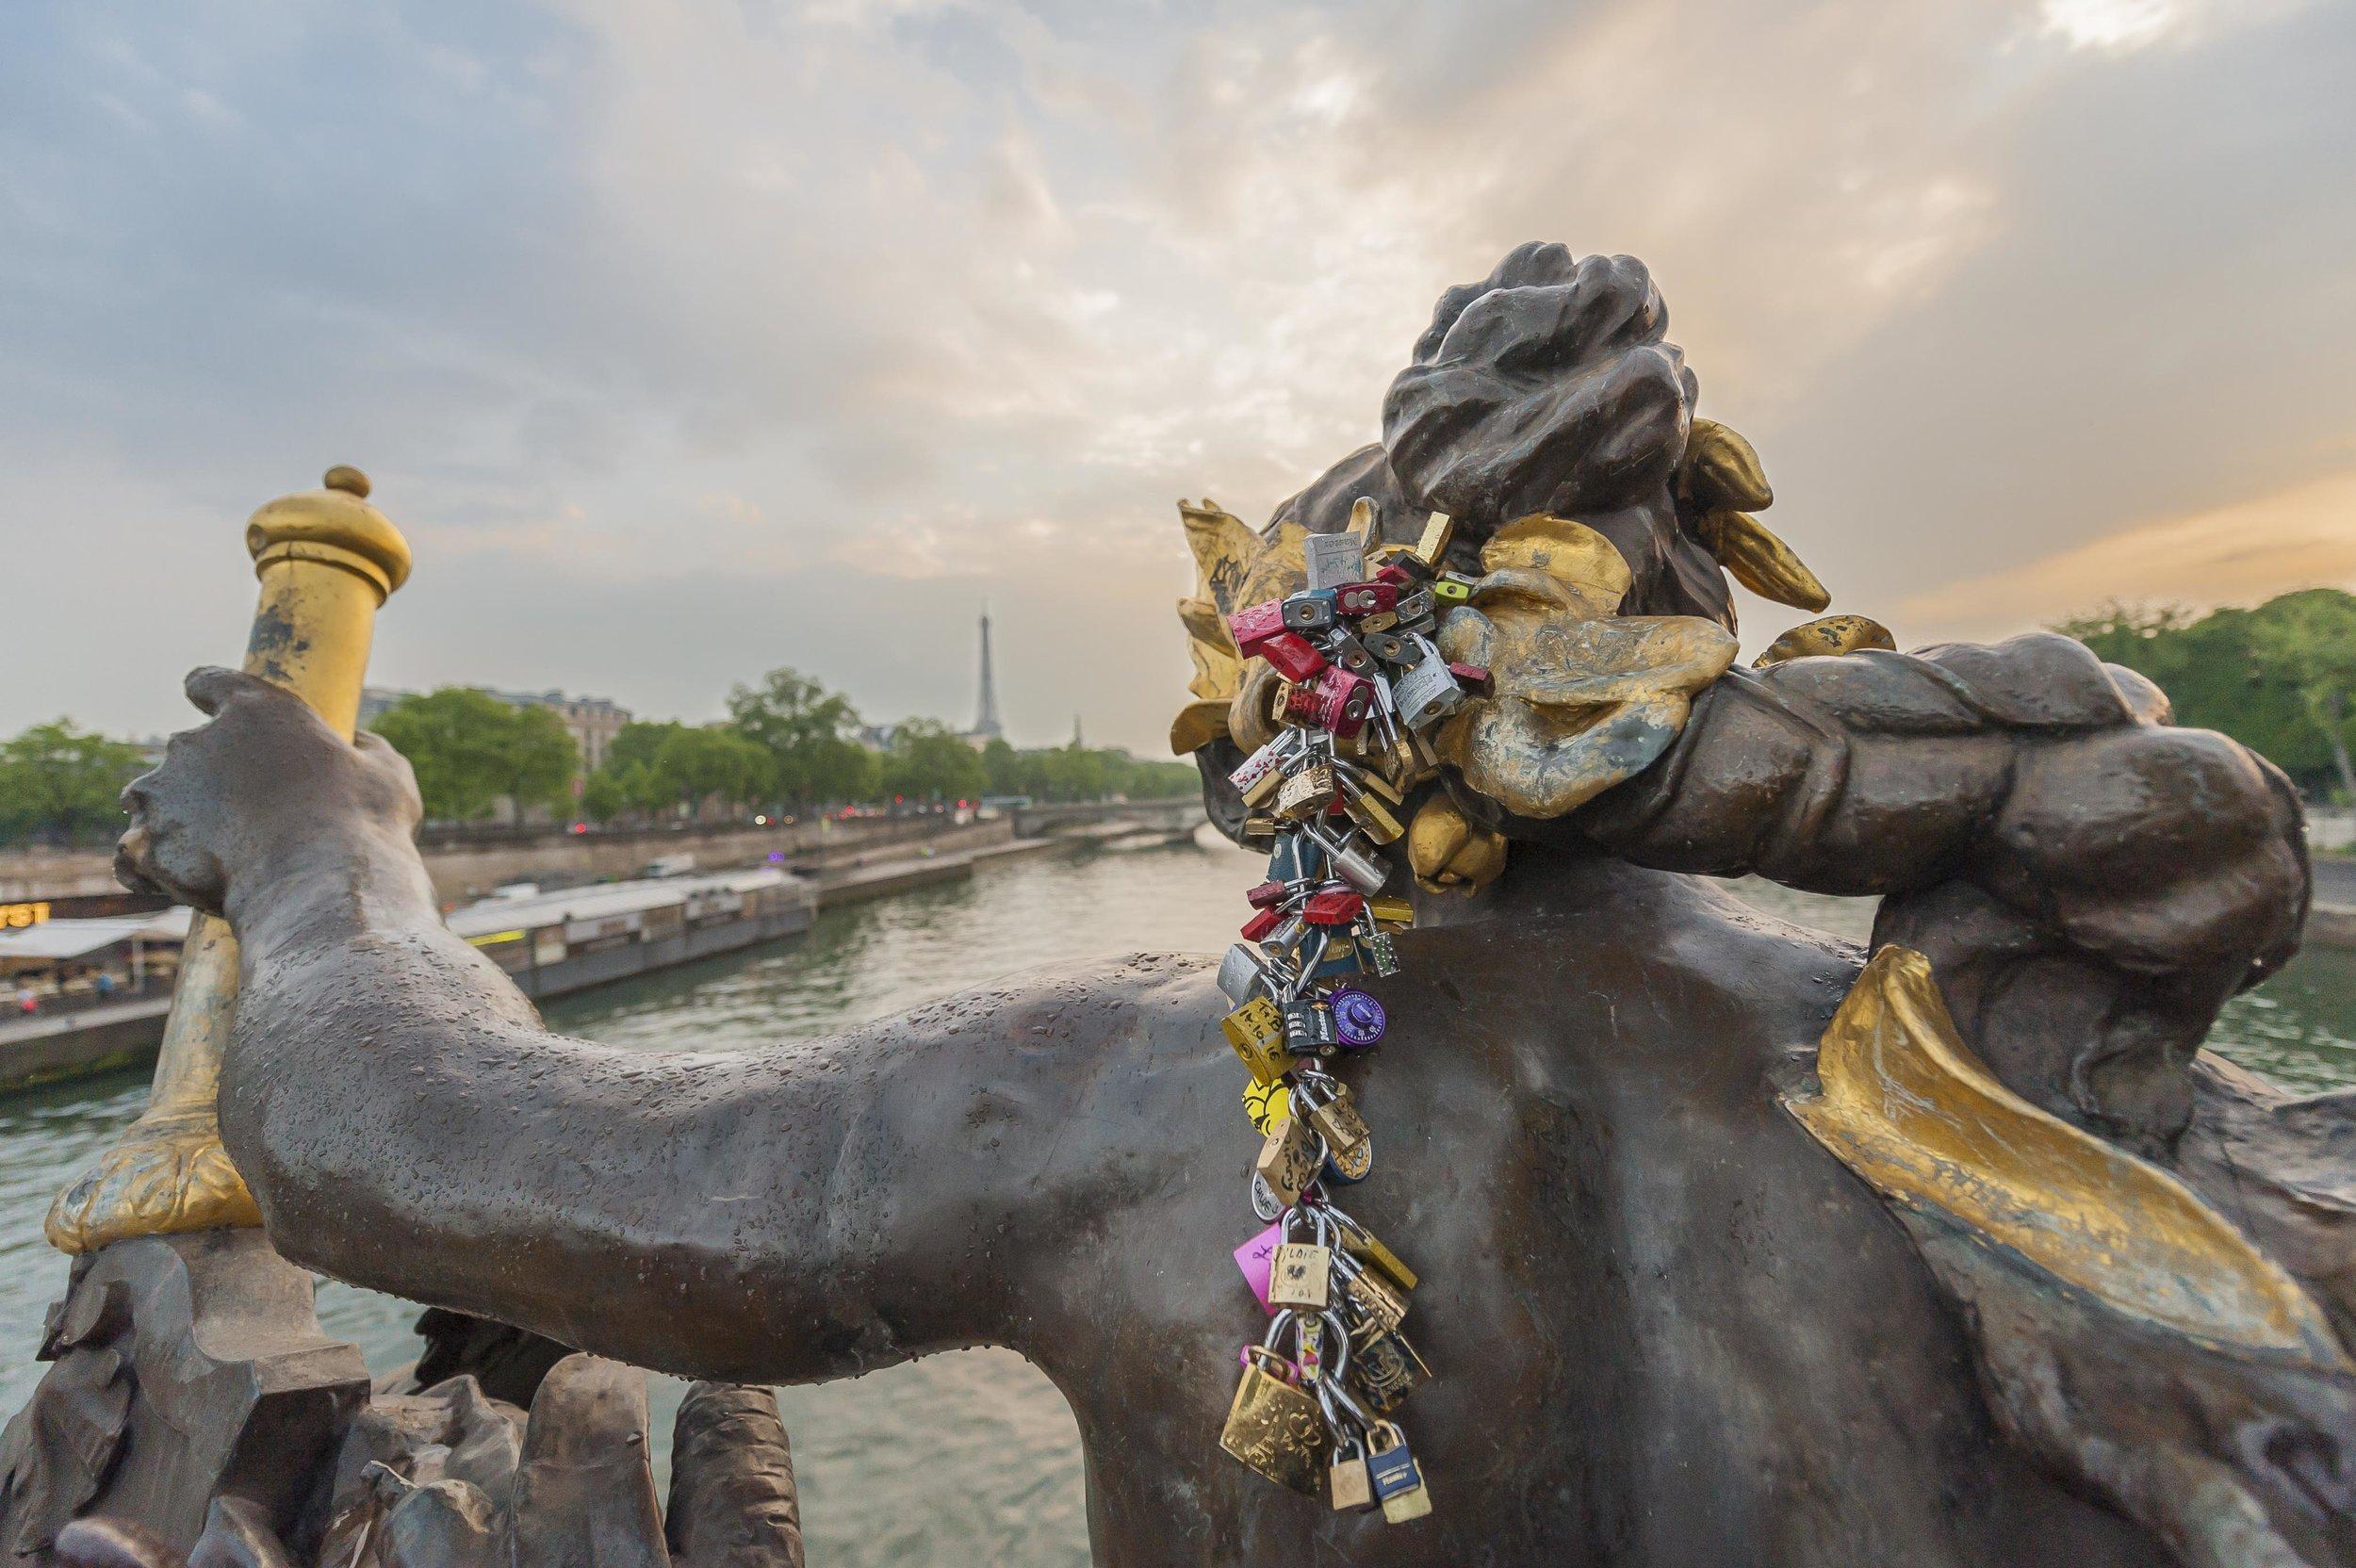 Paris_Nikon_20170504_006.jpg